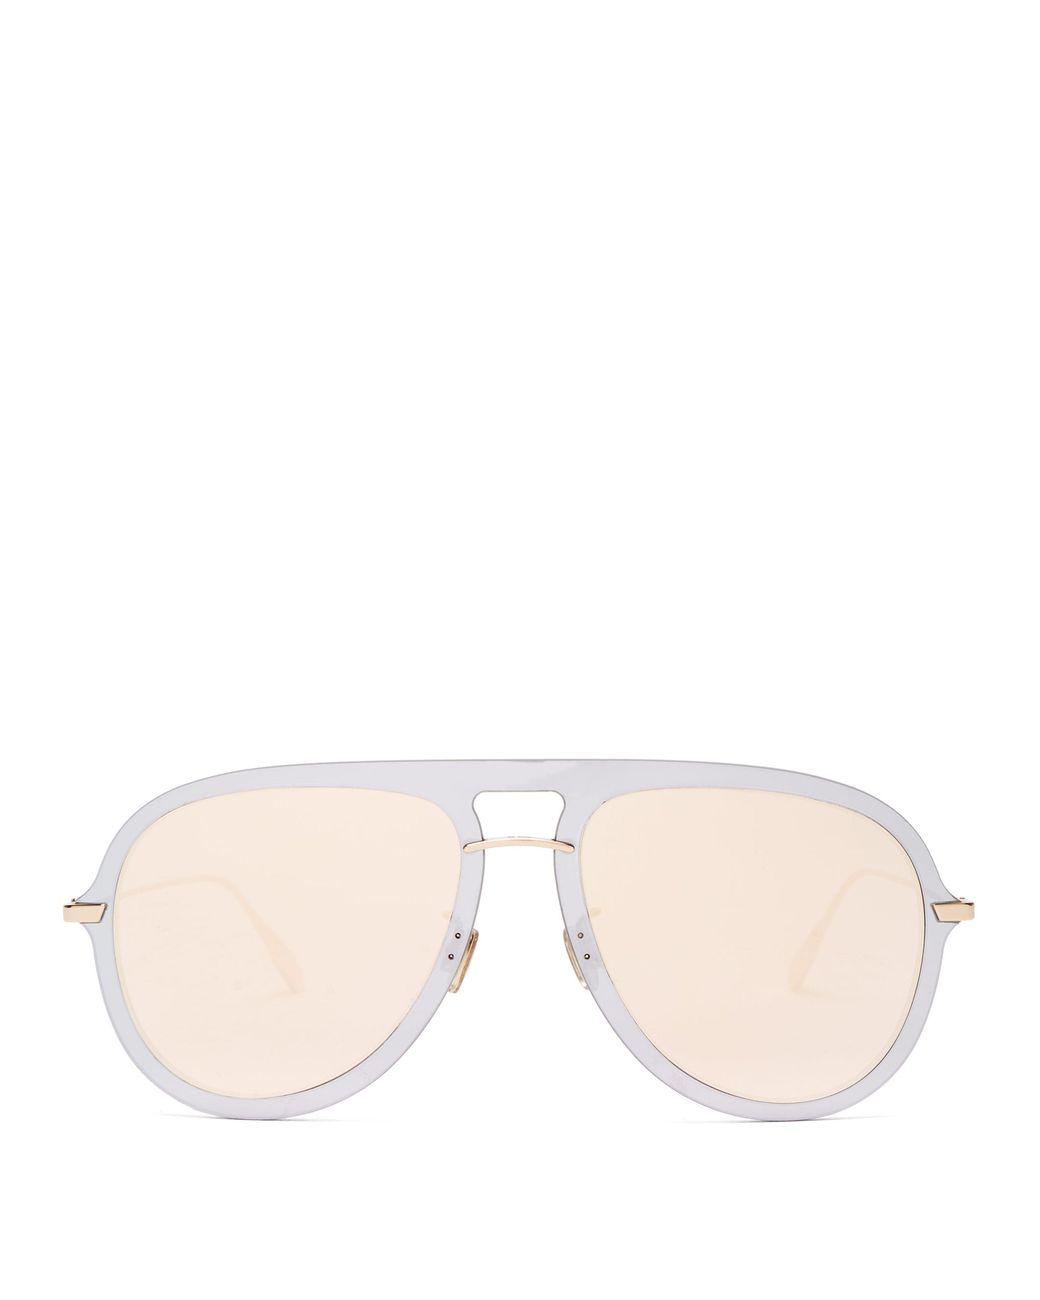 654c14642fb4 Dior Diorultime1 Mirrored Aviator Sunglasses in Metallic - Lyst